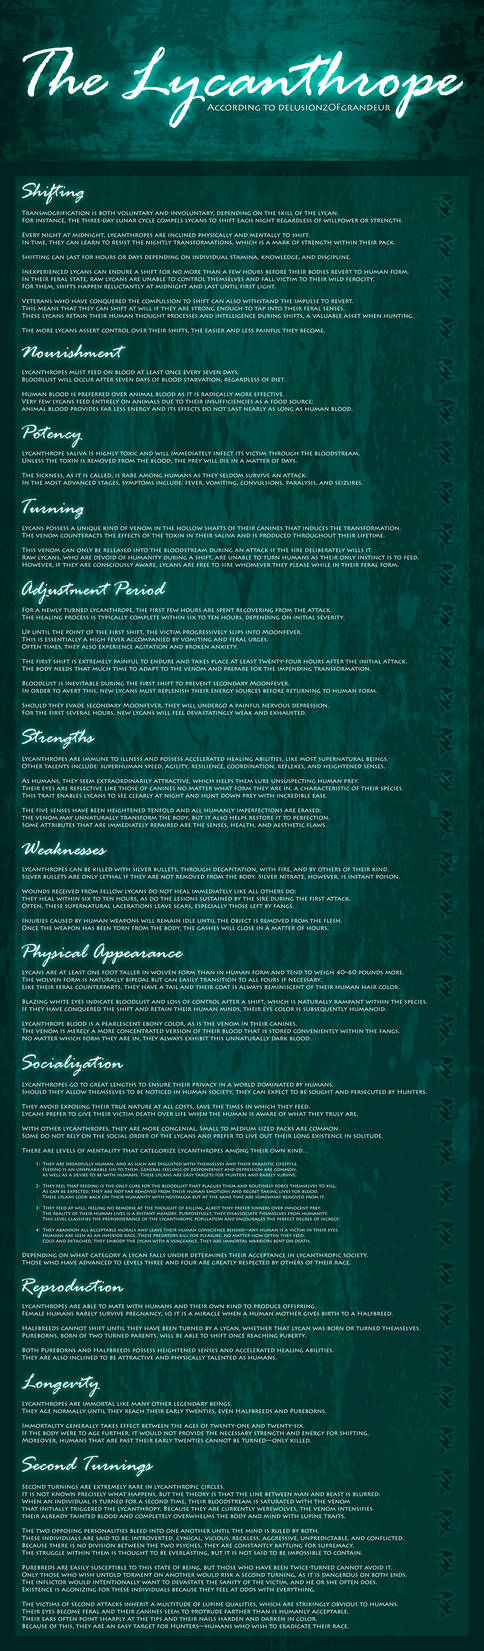 Lycanthropes - Declassified by SaraChristensen